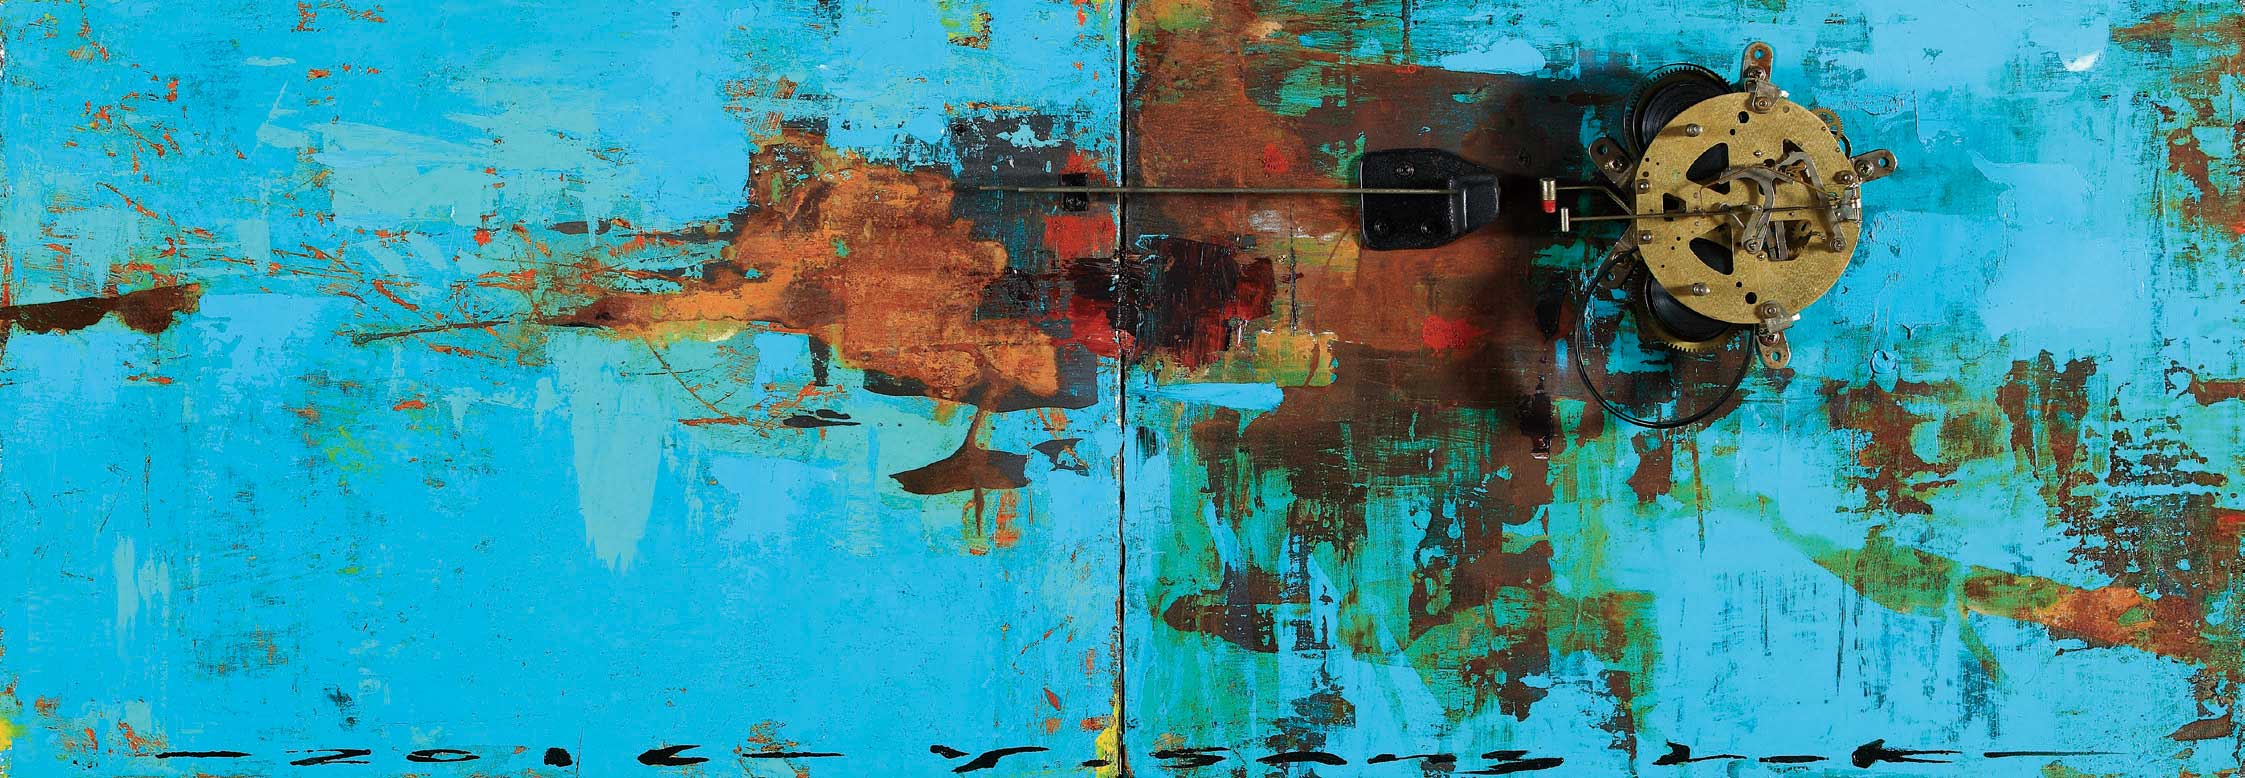 The Memory, 115 x 40 cm, 아크릴, 유화 및 혼합재료, 2017